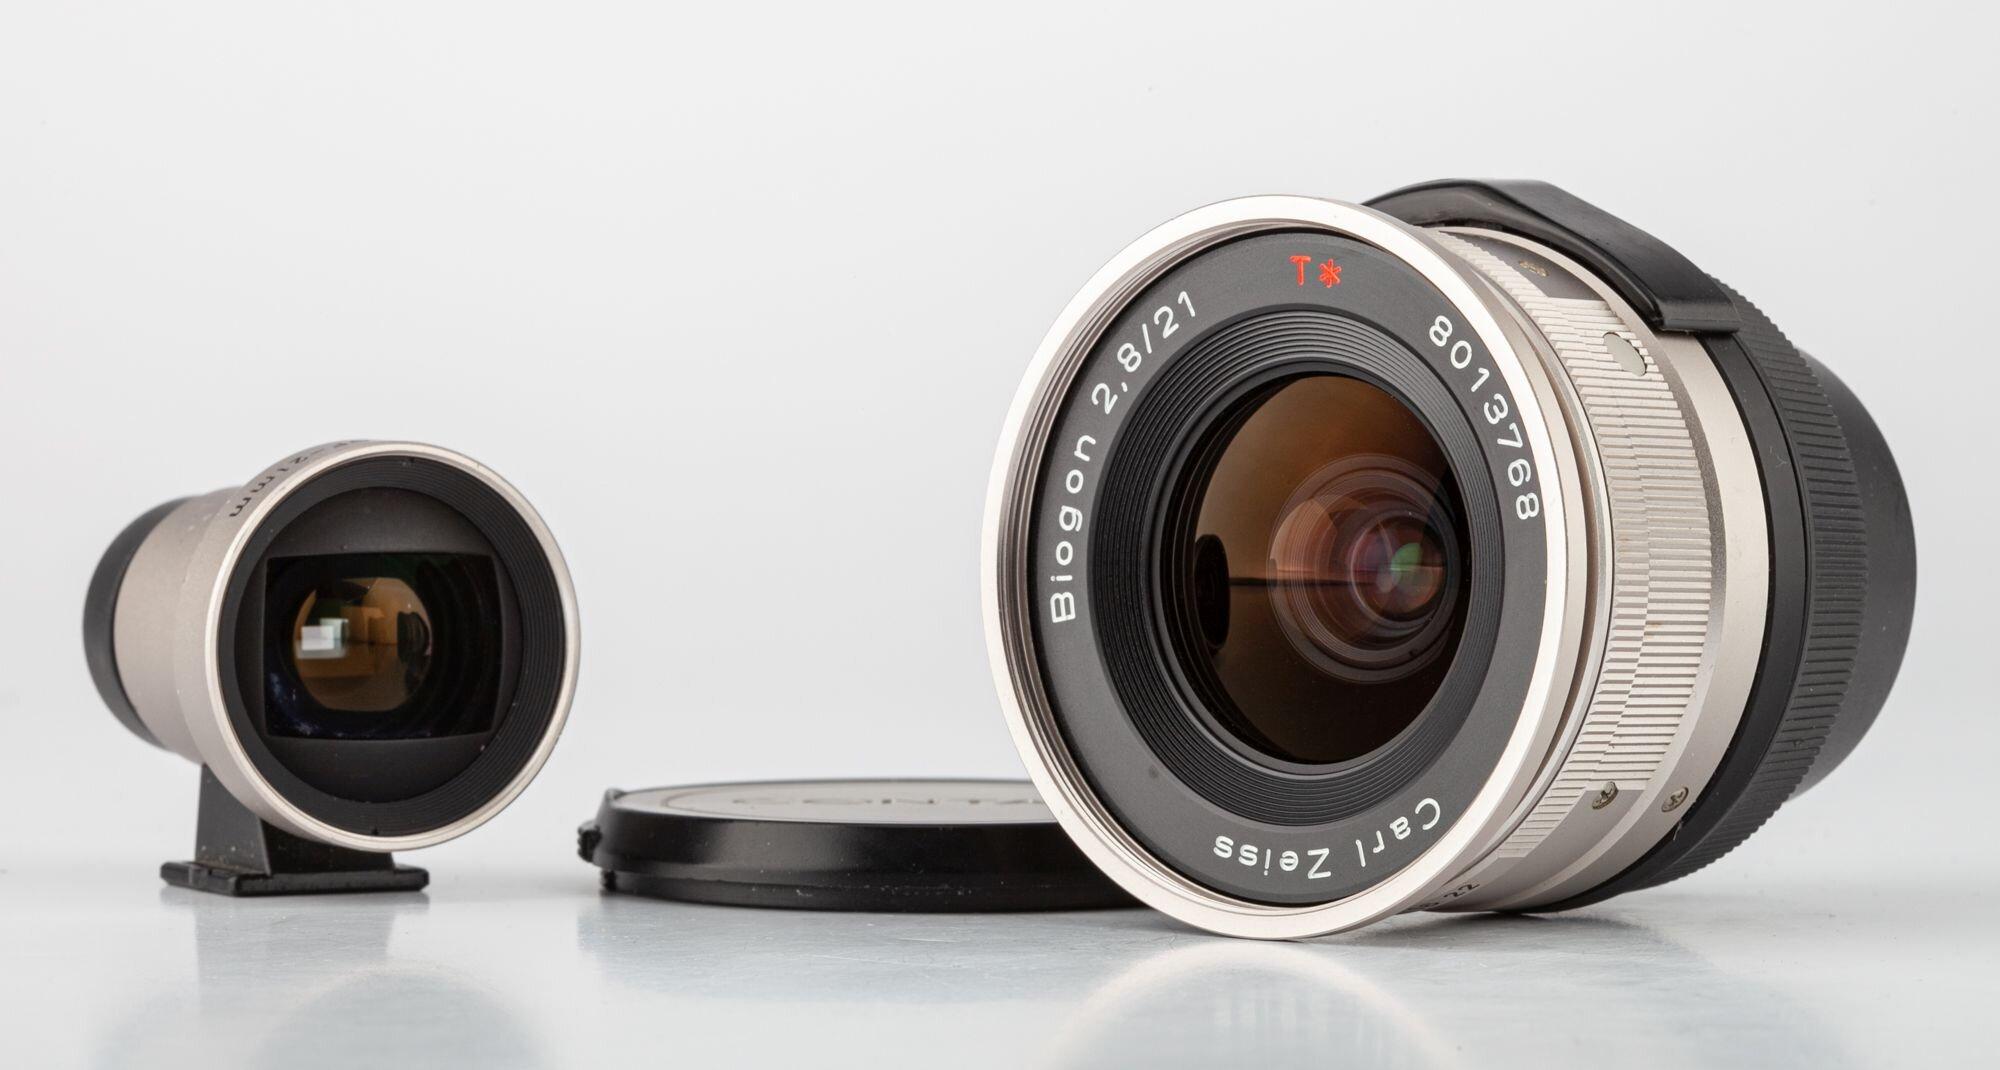 Carl Zeiss Biogon 21mm F/2.8 T* fürContax + GF-21mm